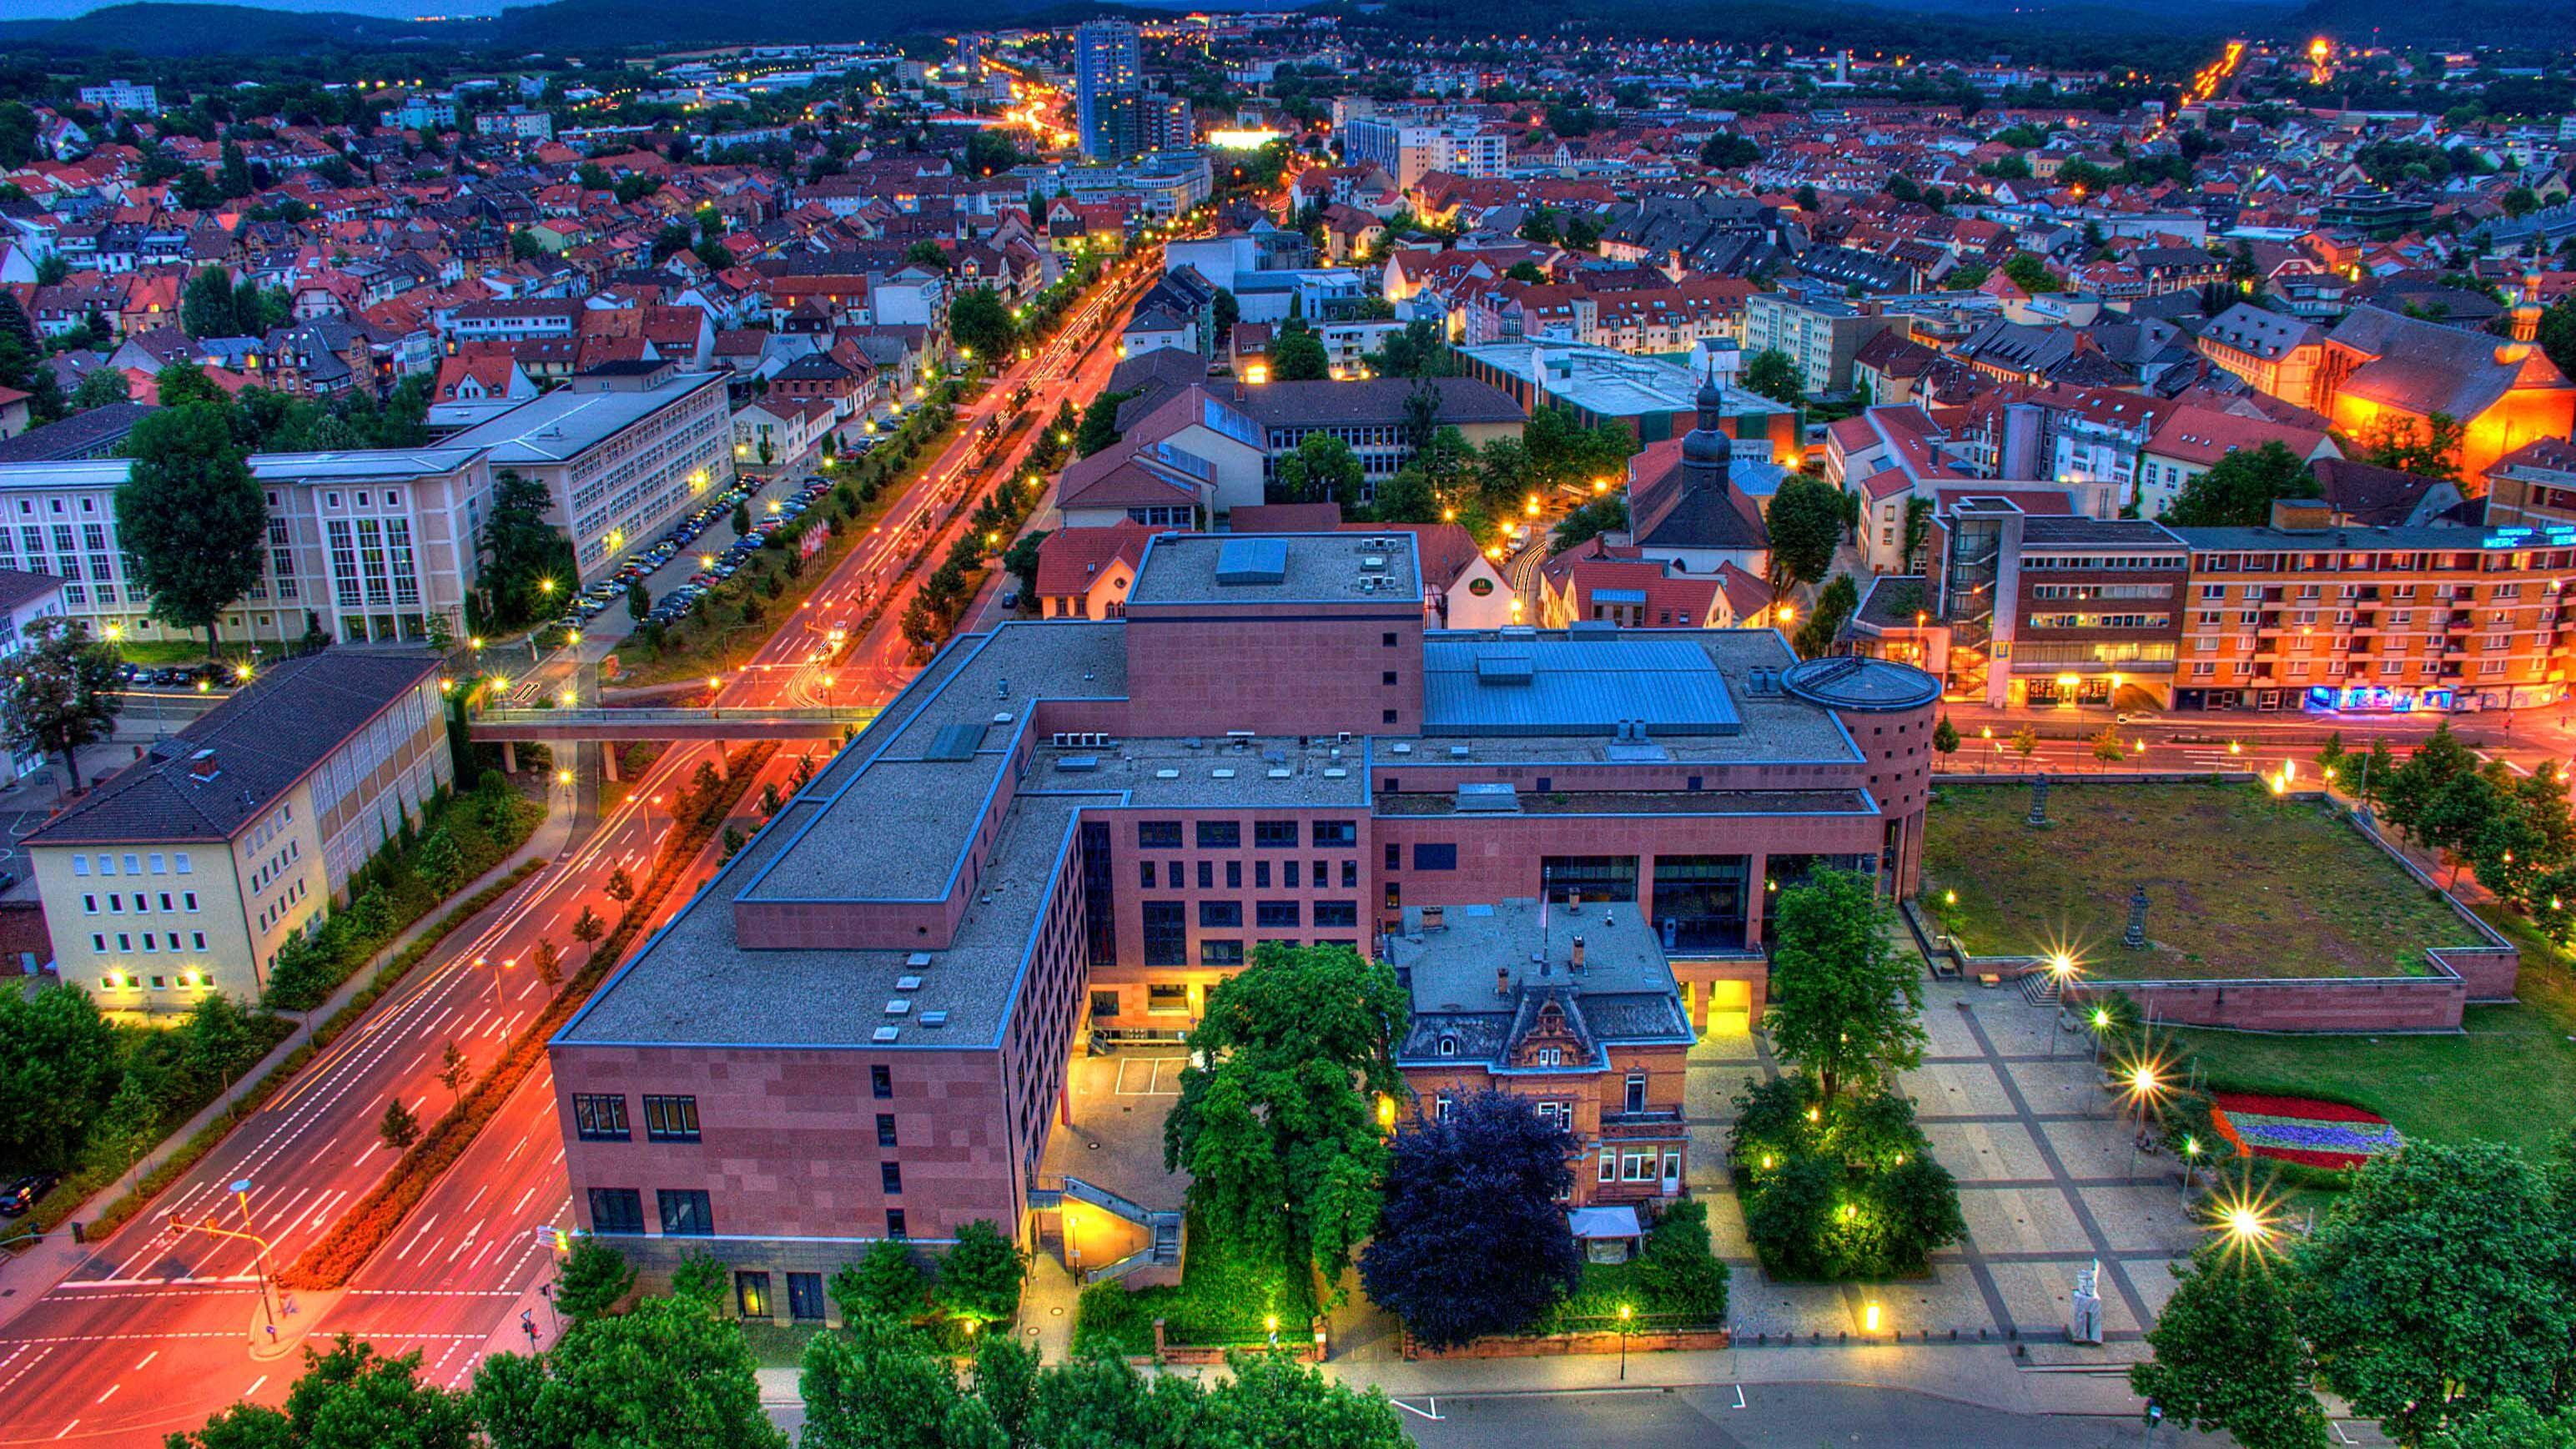 Stadt Kaiserslautern vergibt einen neuen Kulturpreis-Image